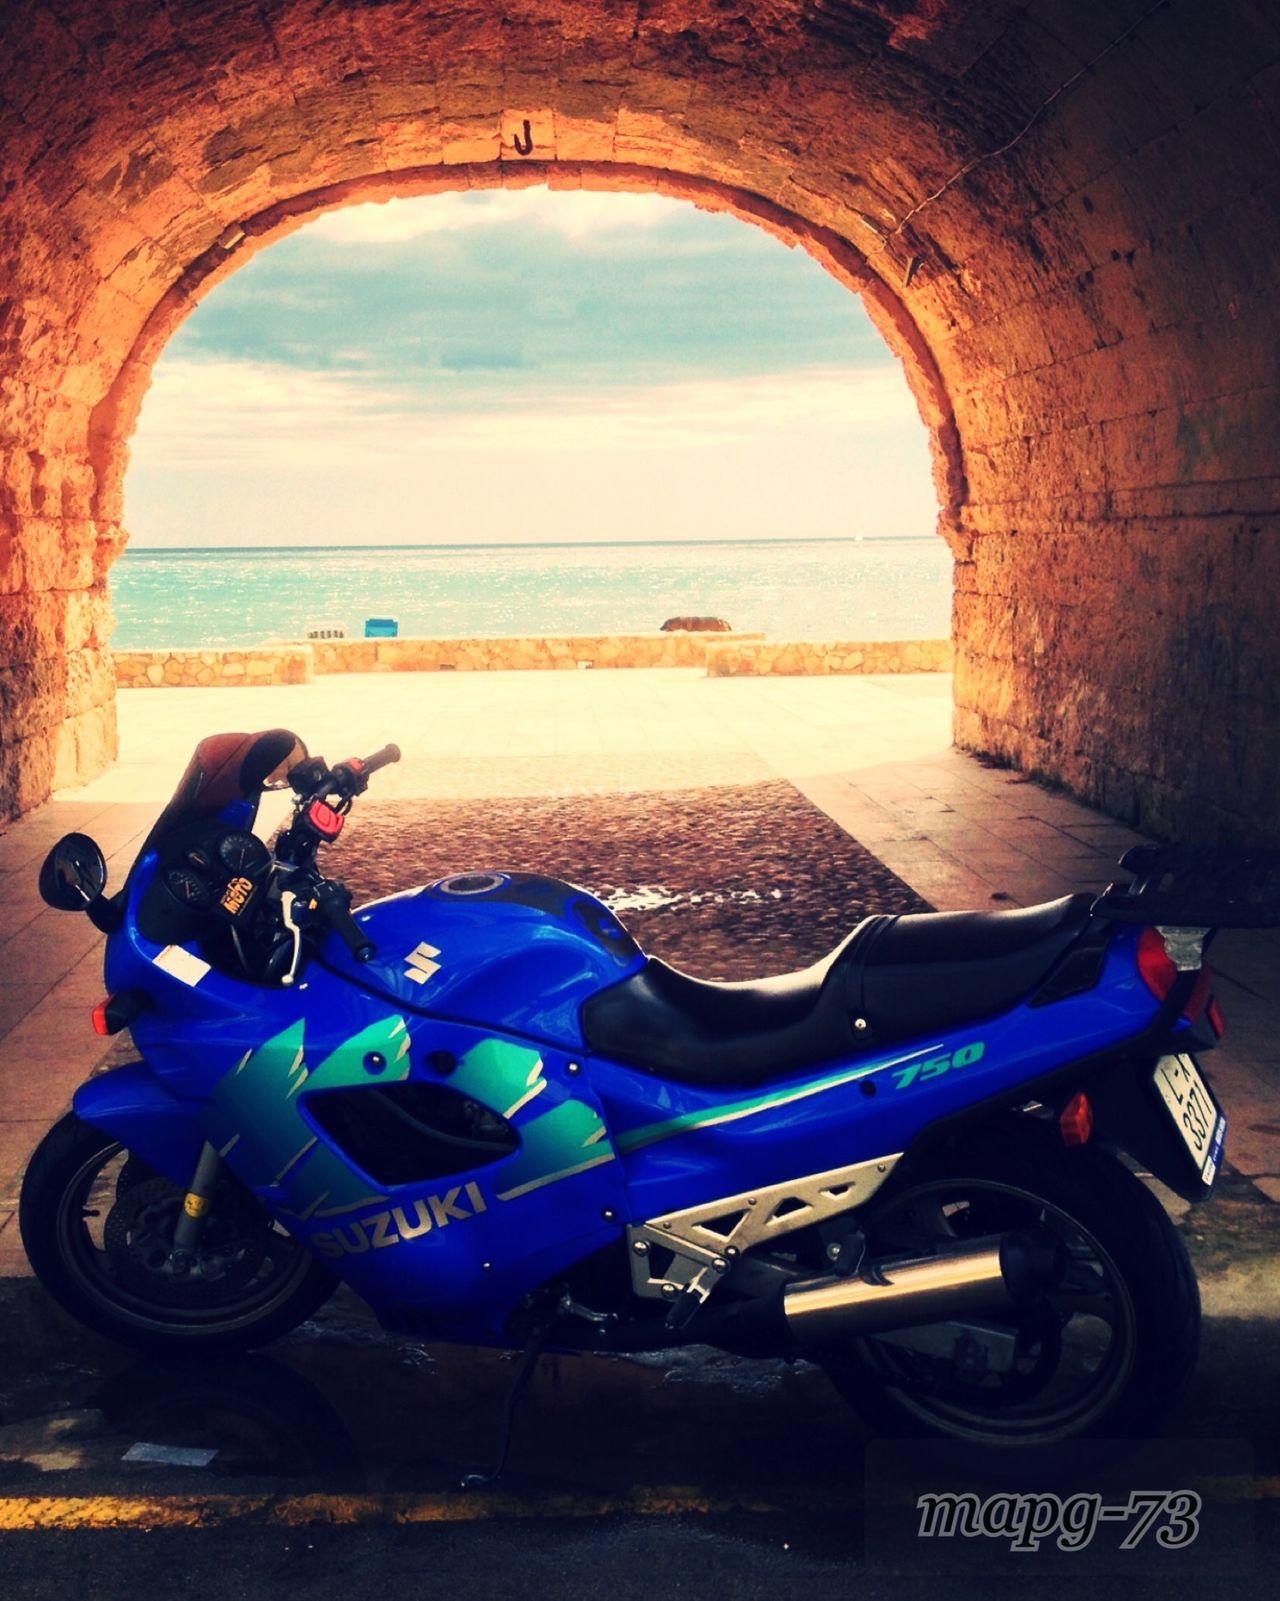 Taking A Motorcycle Tour Suzuki Riding My Motorcycle Spending Time Sea Horizon Over Water Taking Photos GSXF-750 Gsx Gsxf